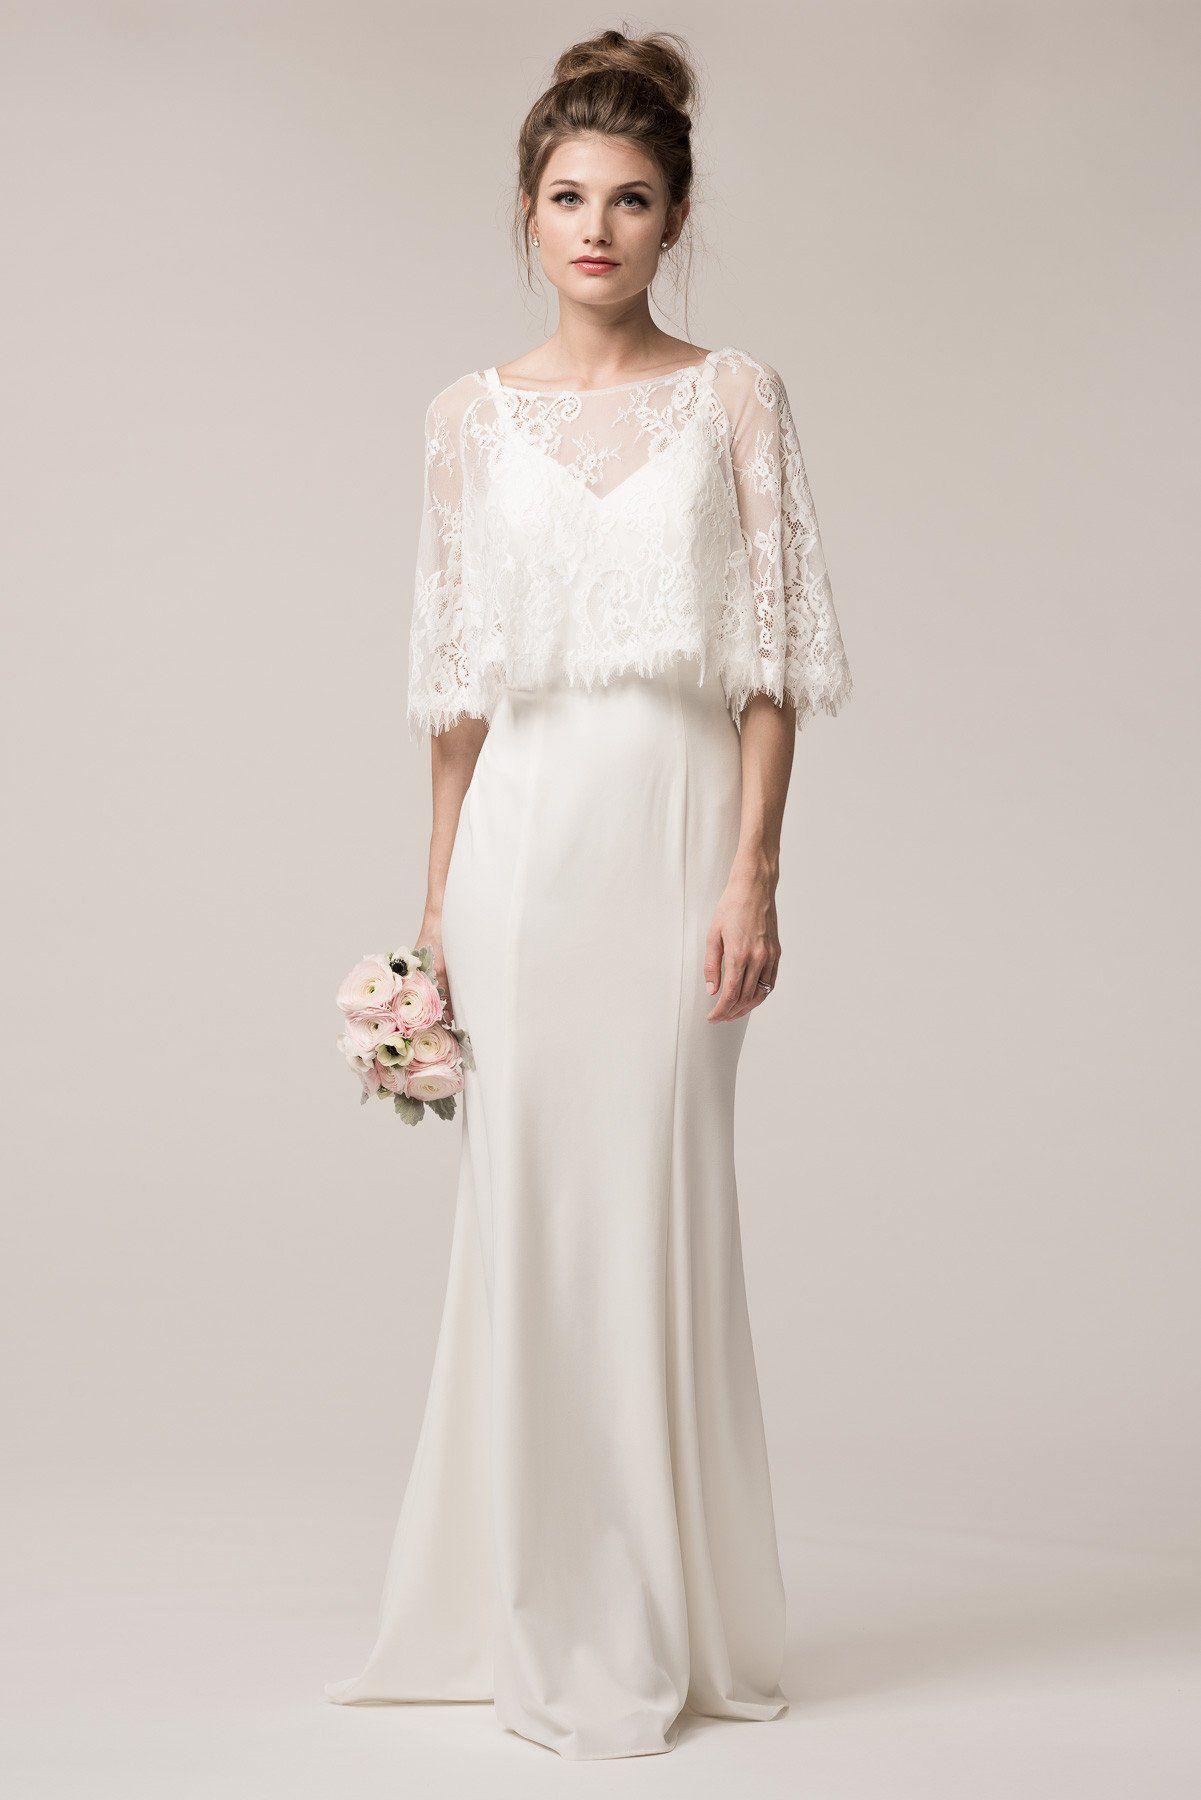 Vintage style simple bohemian wedding dress BC TRW24606